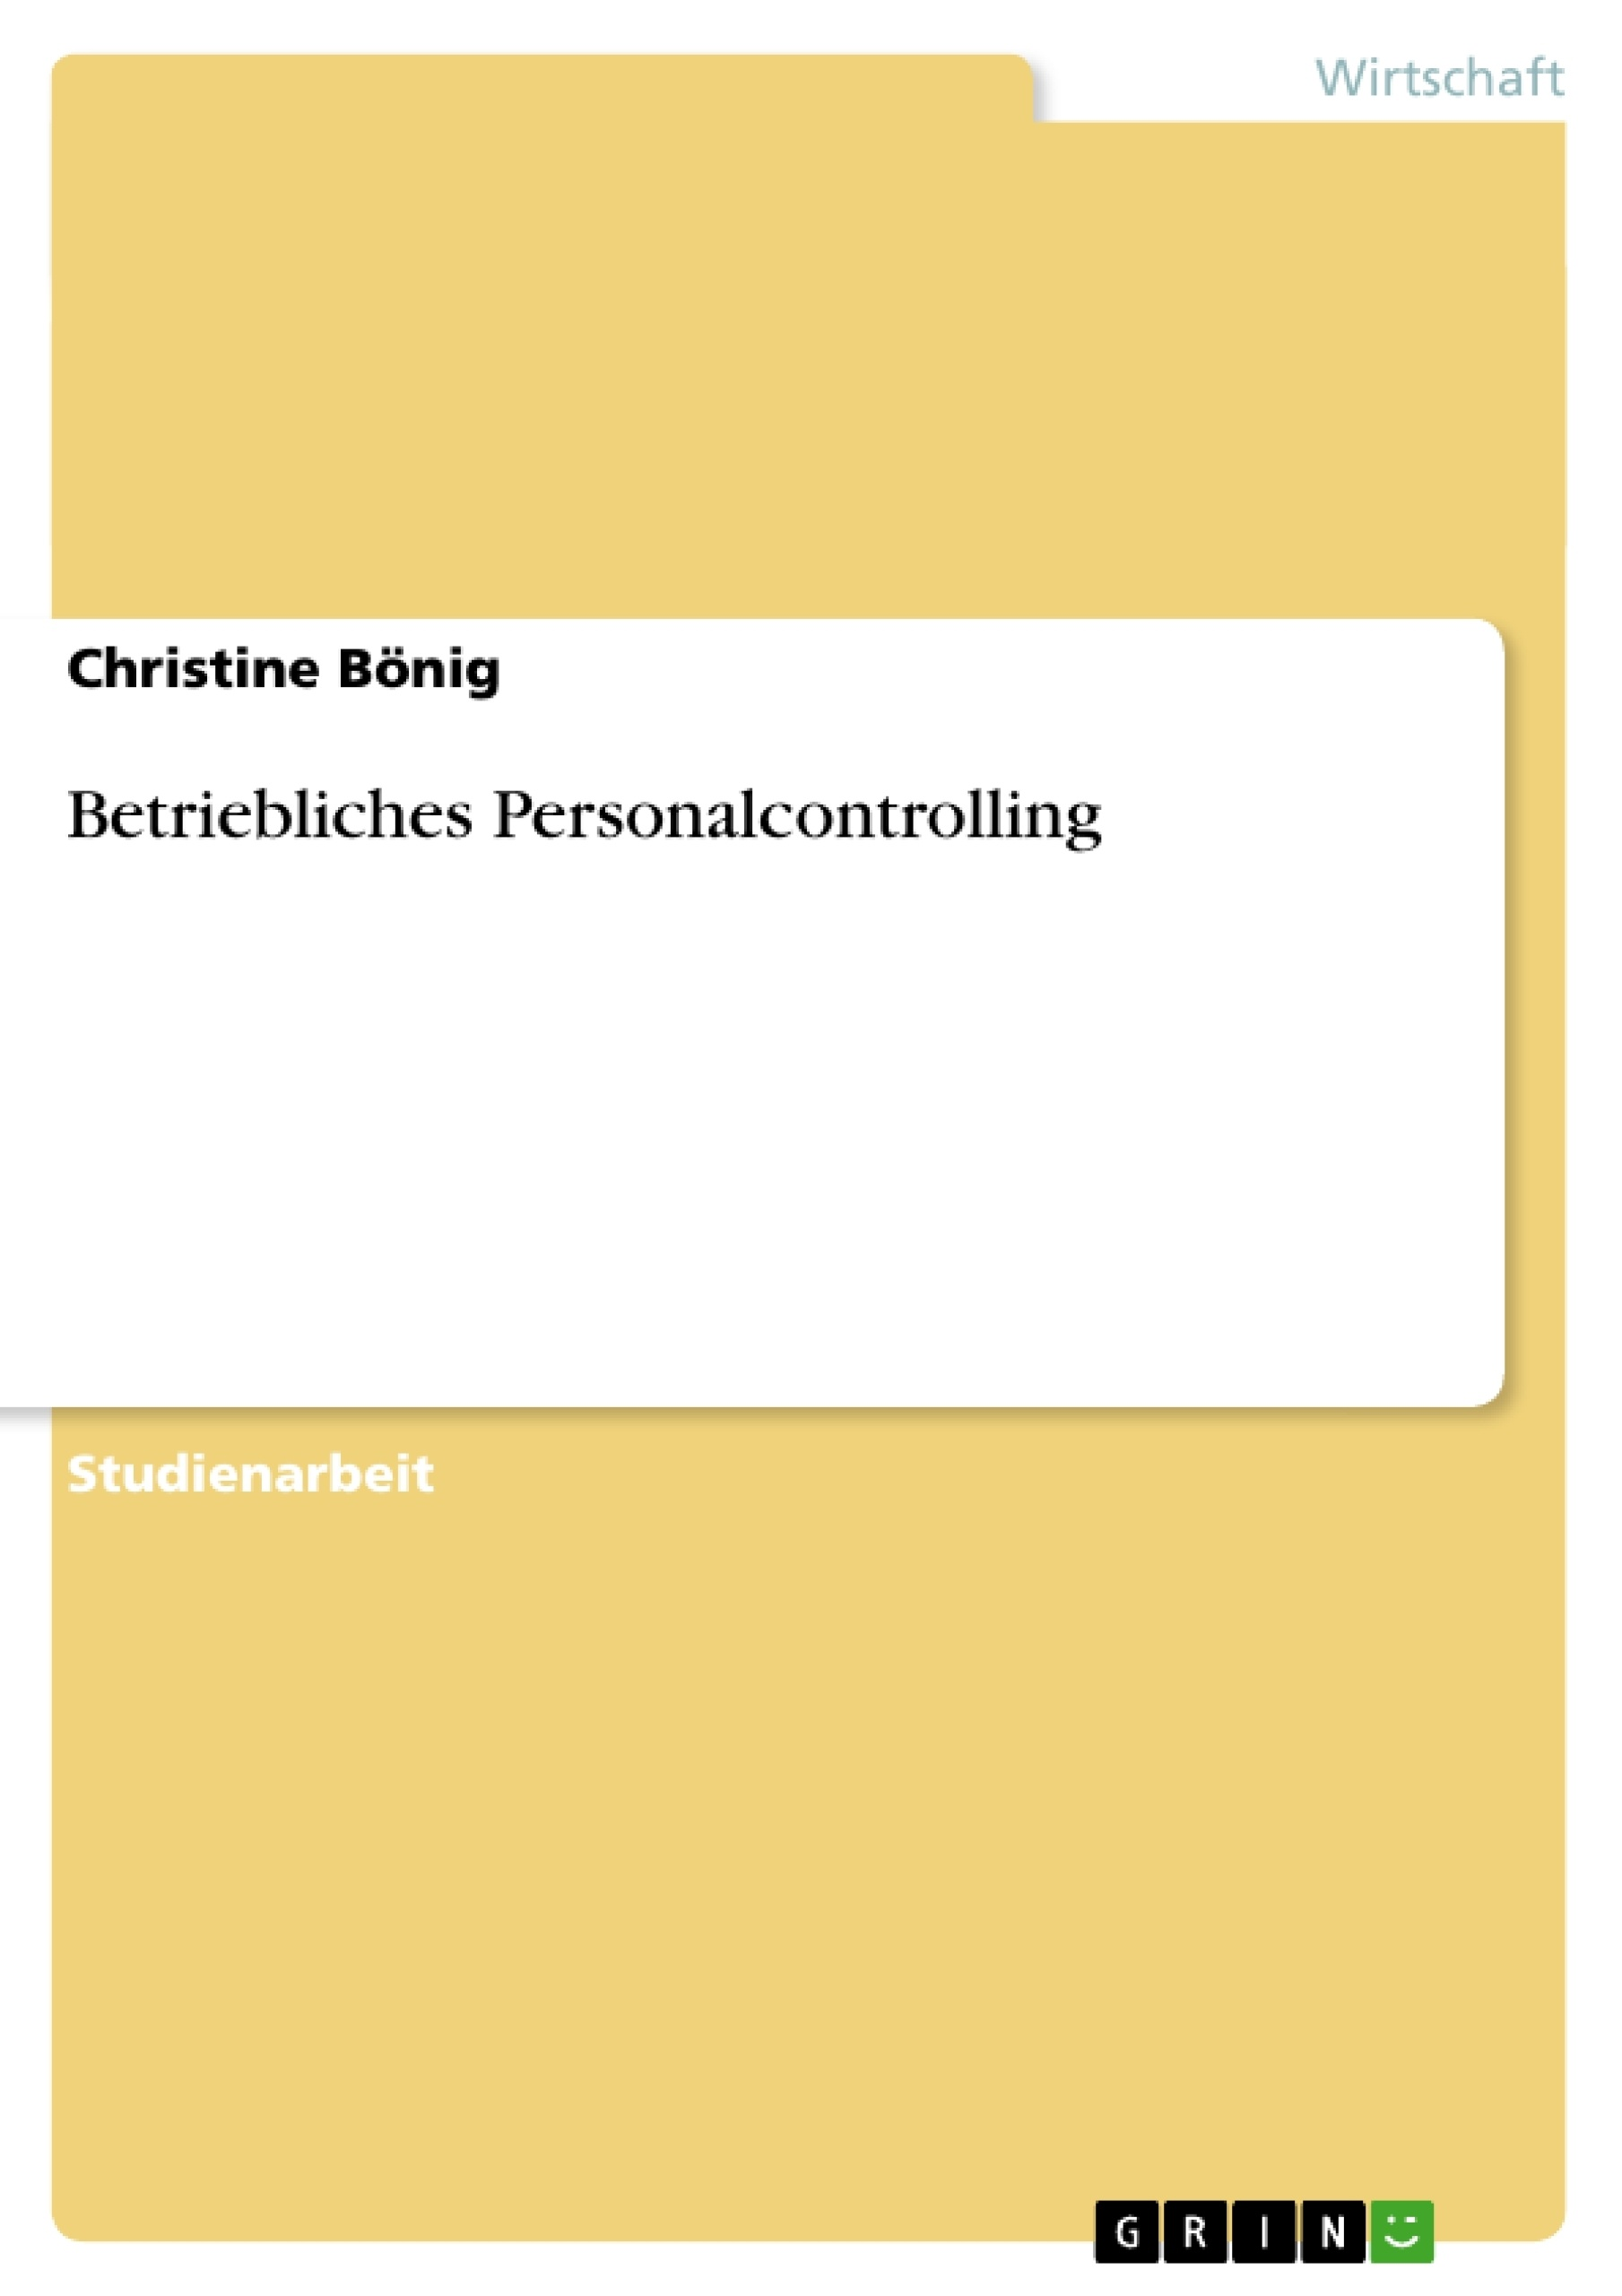 Titel: Betriebliches Personalcontrolling